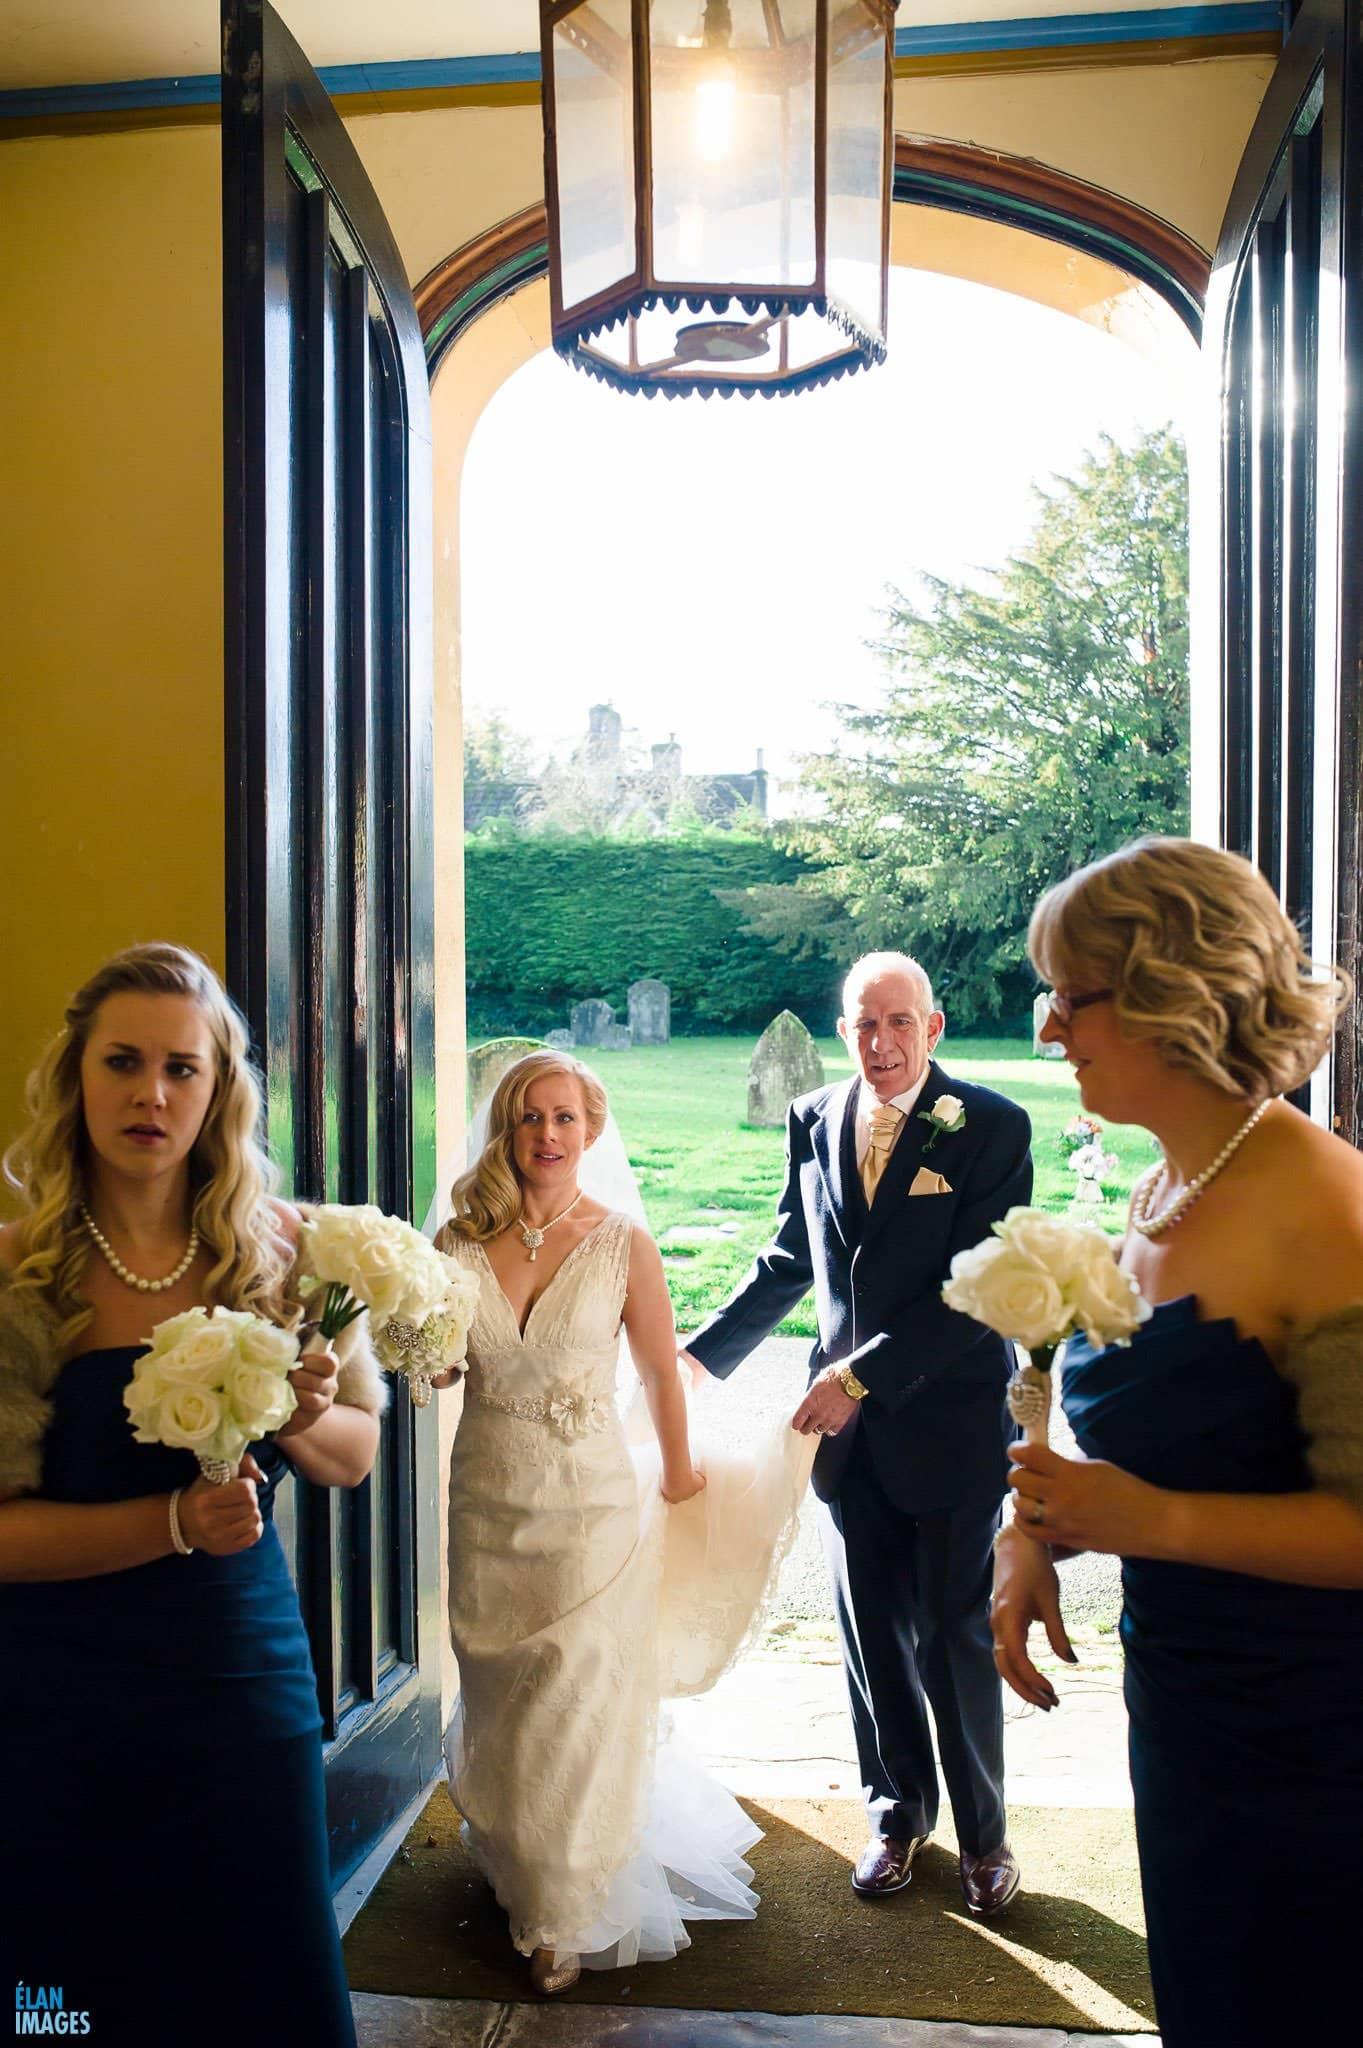 Wedding at leigh park hotel -050